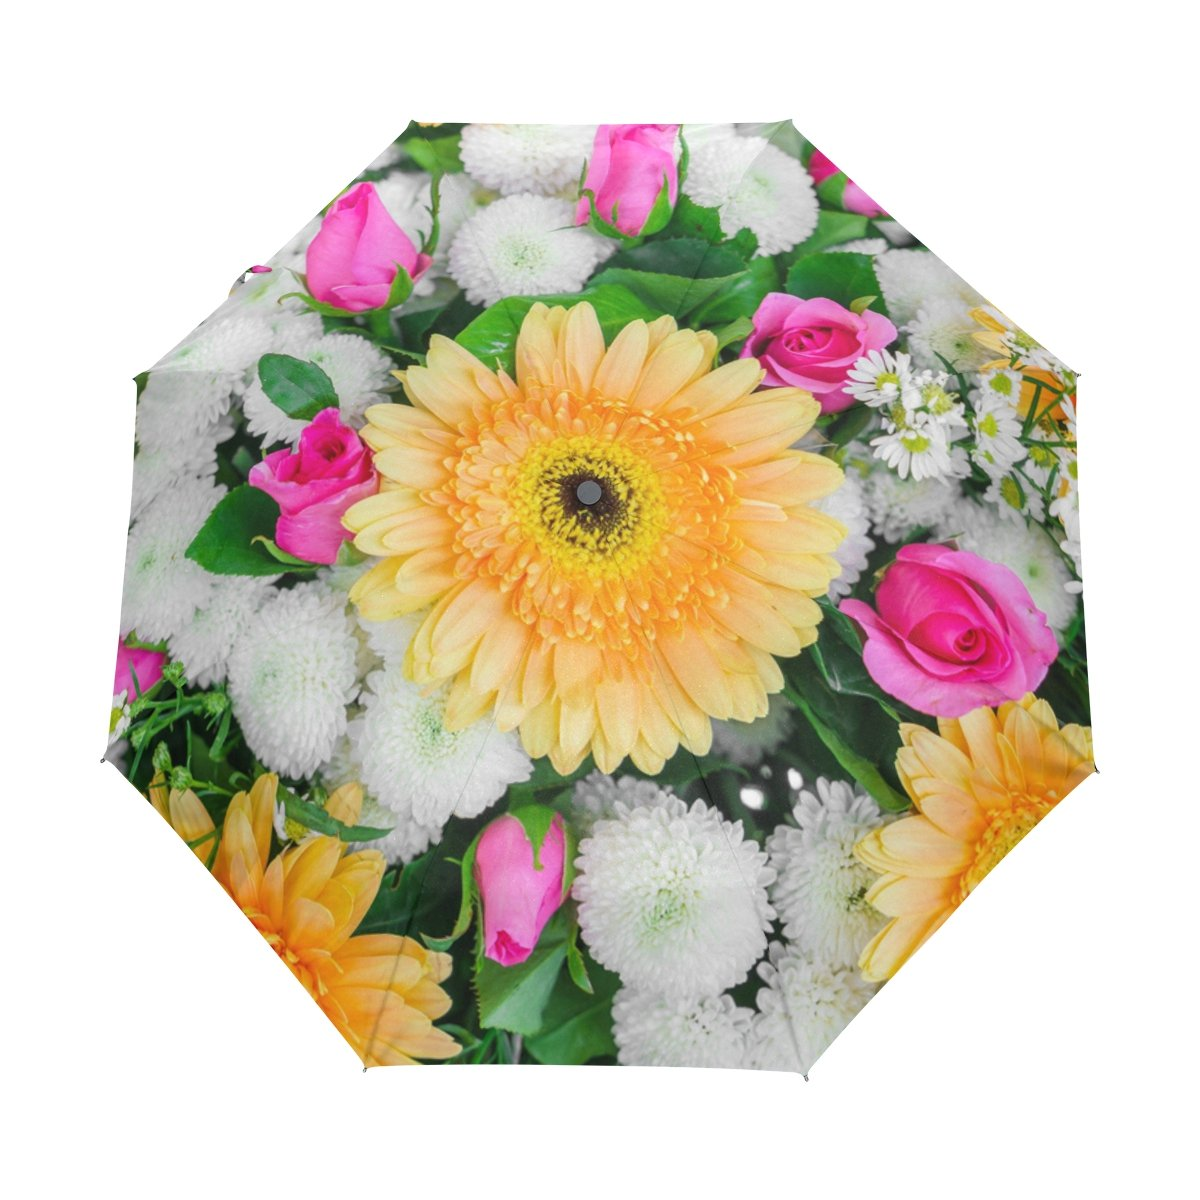 Senya Saobao防風と防雨トラベル傘with自動開いて閉じFolding美しい花バレンタインのとウェディングシーンポータブル折りたたみ式太陽雨傘 B07FFTKQ2T